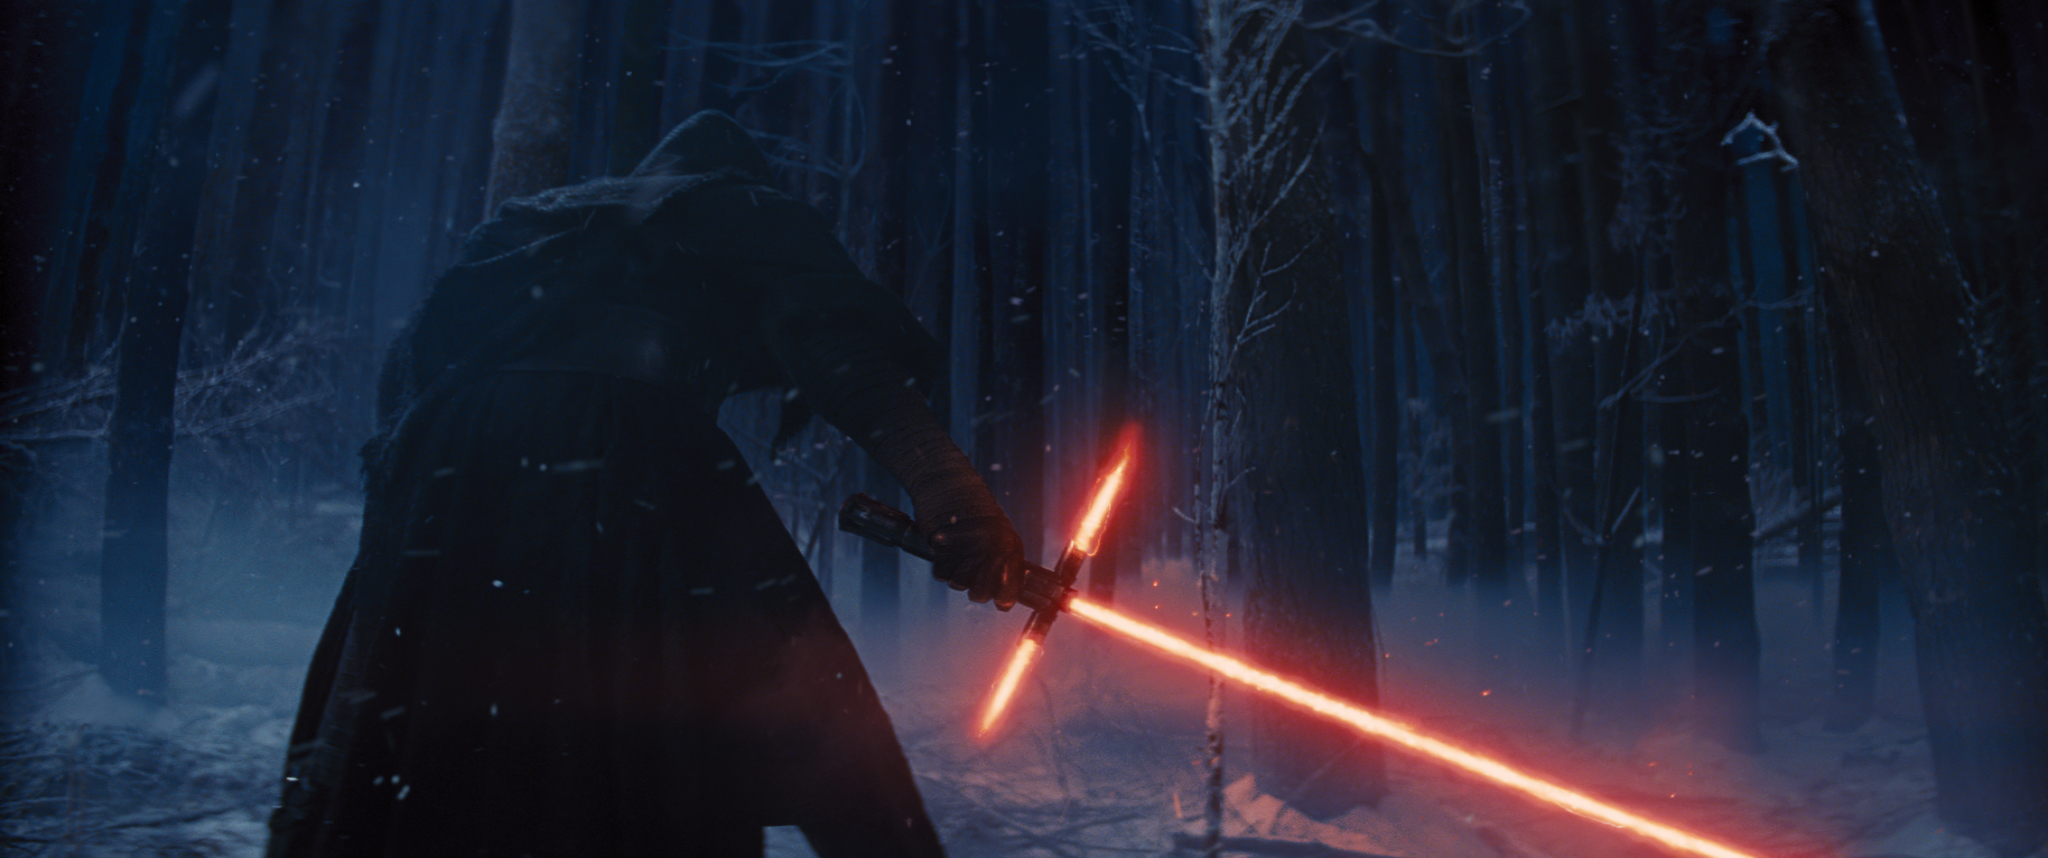 Star Wars The Force Awakens Lightsaber Hobbit Movie News And